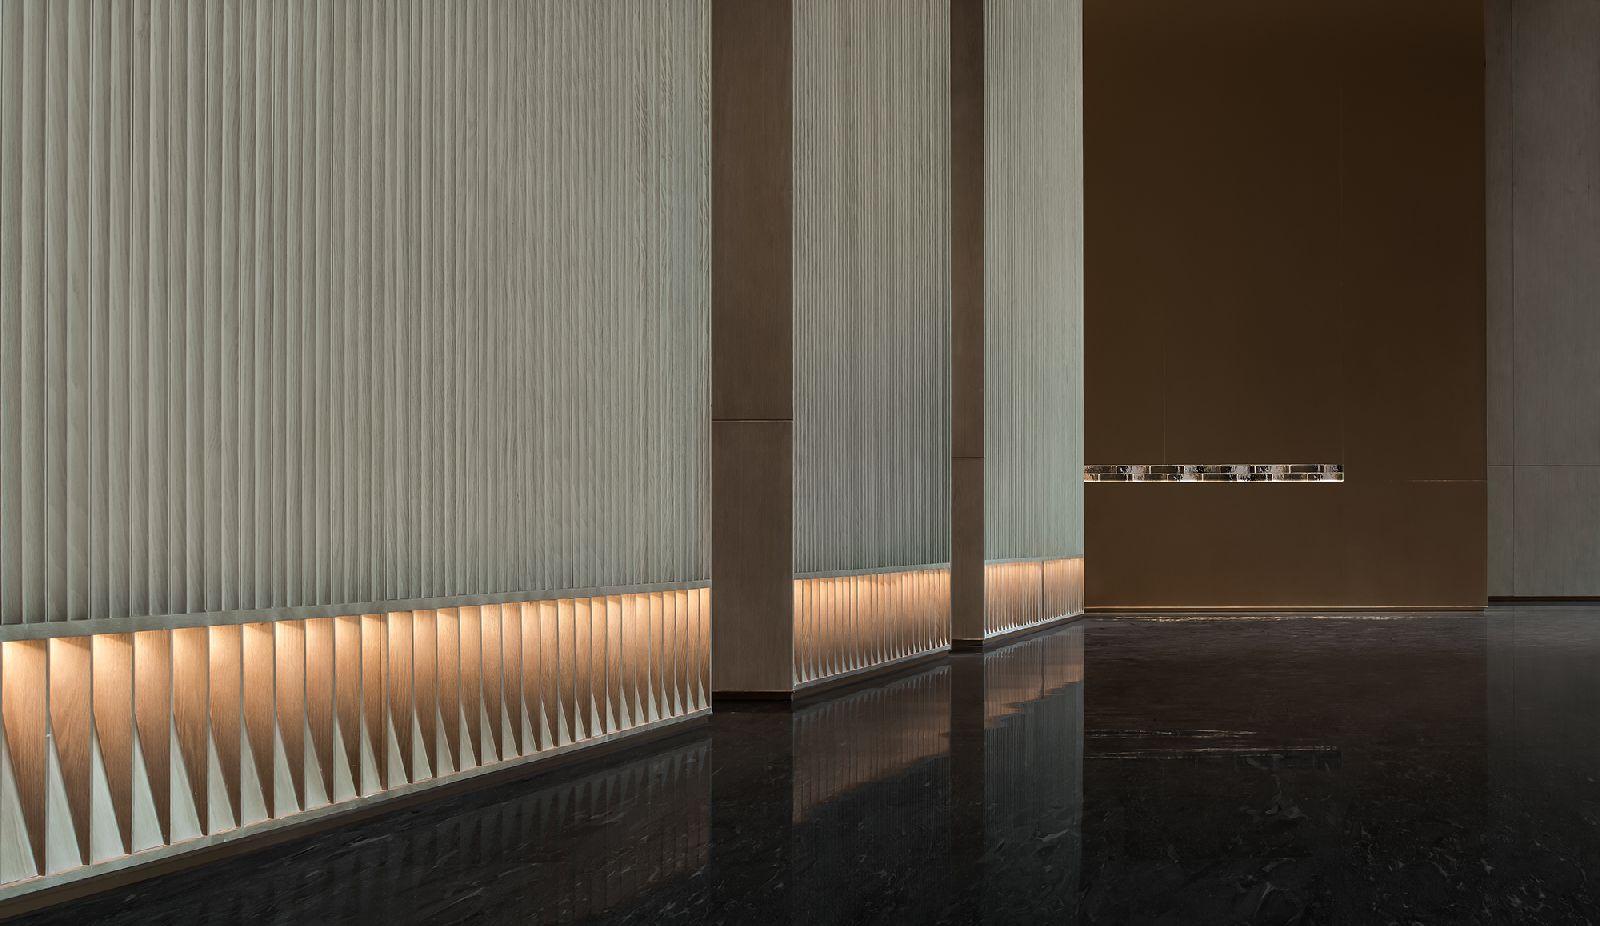 Qin Wang Fu Exhibition Hall